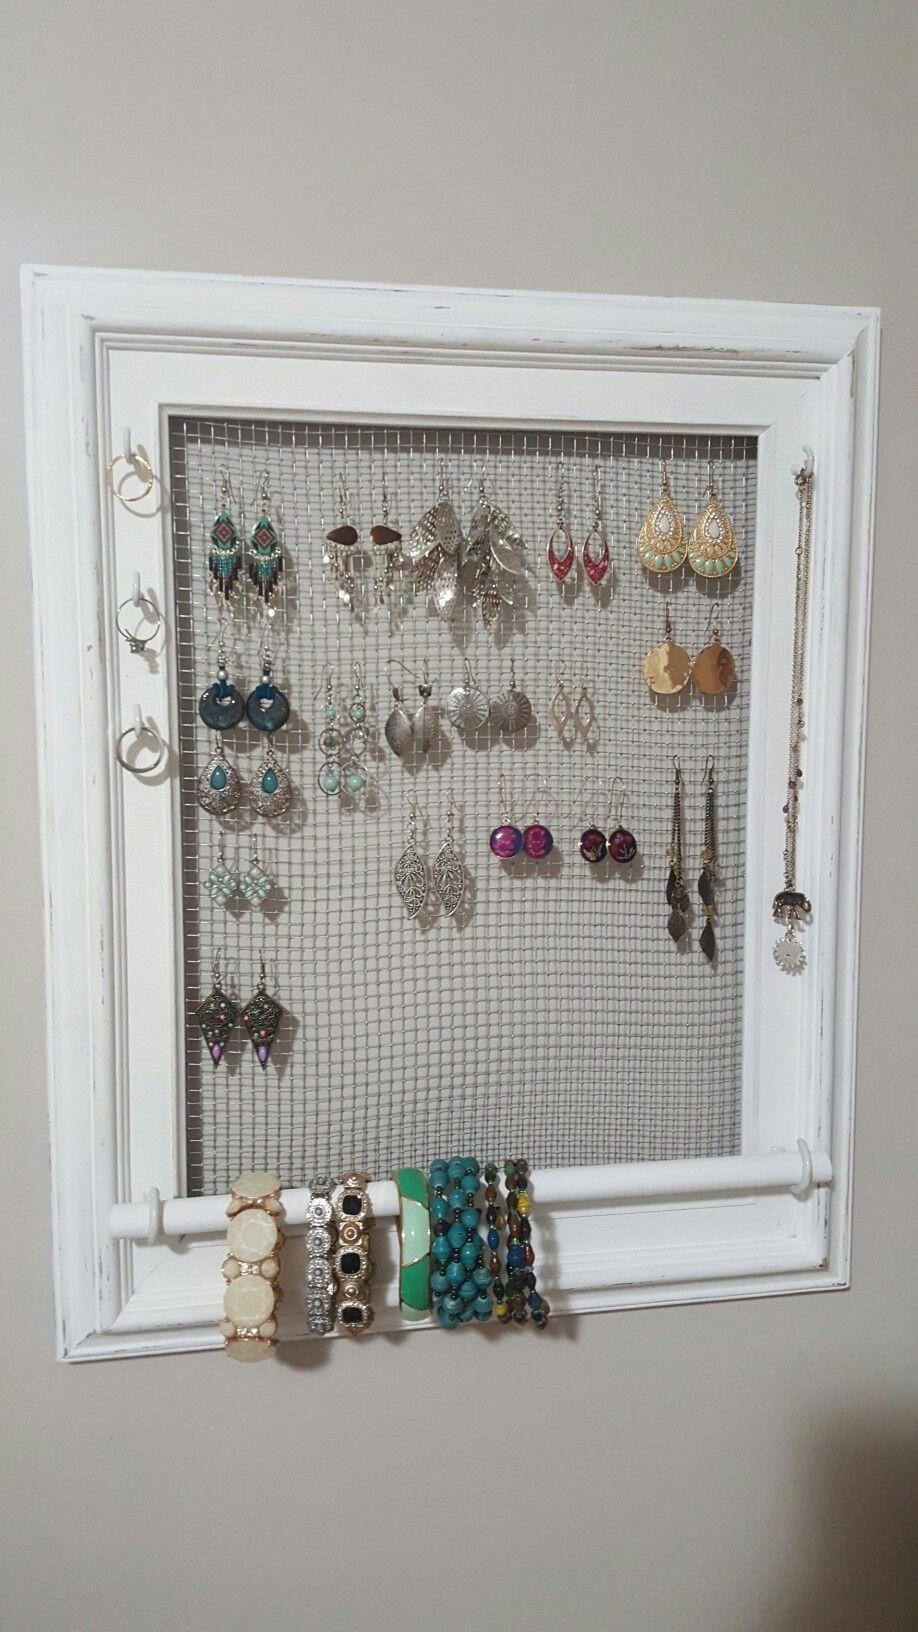 Jewelry Wall Hanger Jewelry Storage Boxes Drawers Bracelet Organizer Diy 20190210 Jewelry Wall Hanger Jewelry Storage Diy Jewelry Wall